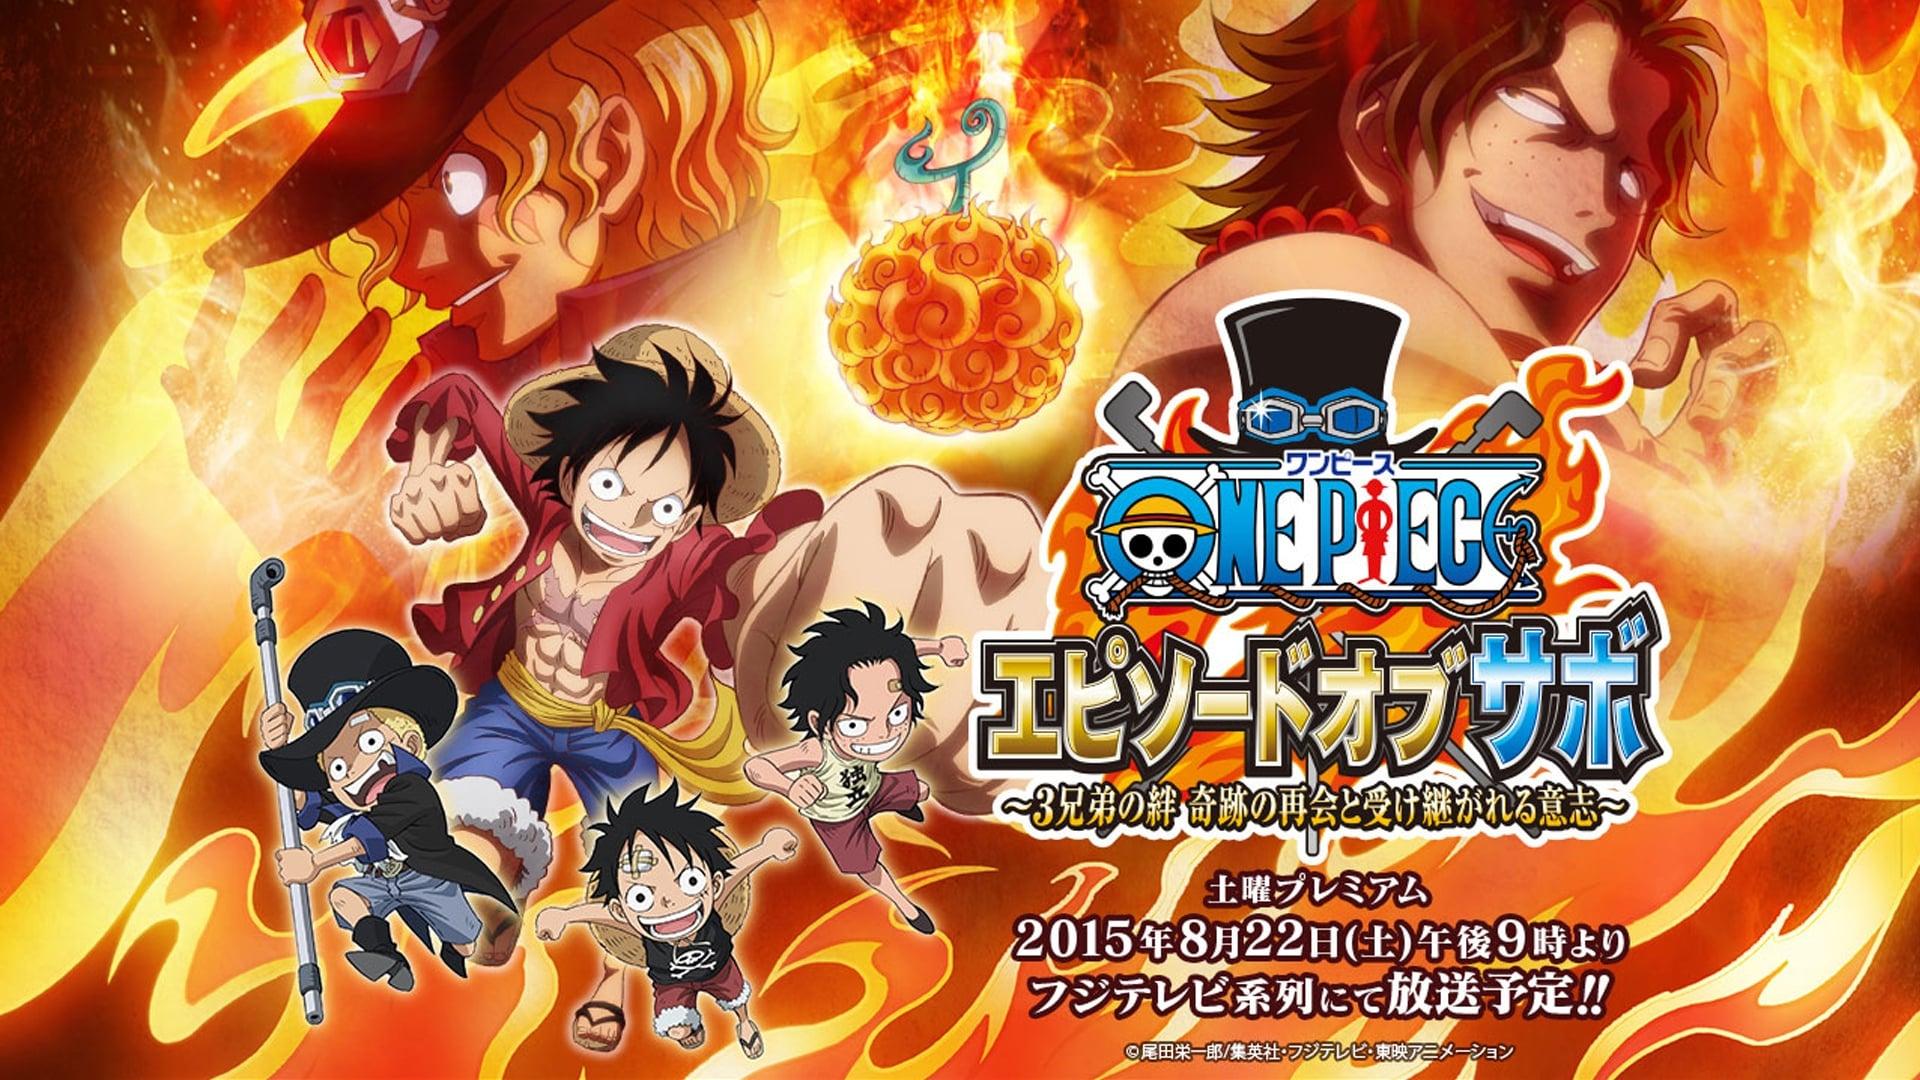 One Piece Season 0 :Episode 29  Episode of Sabo: Bond of Three Brothers